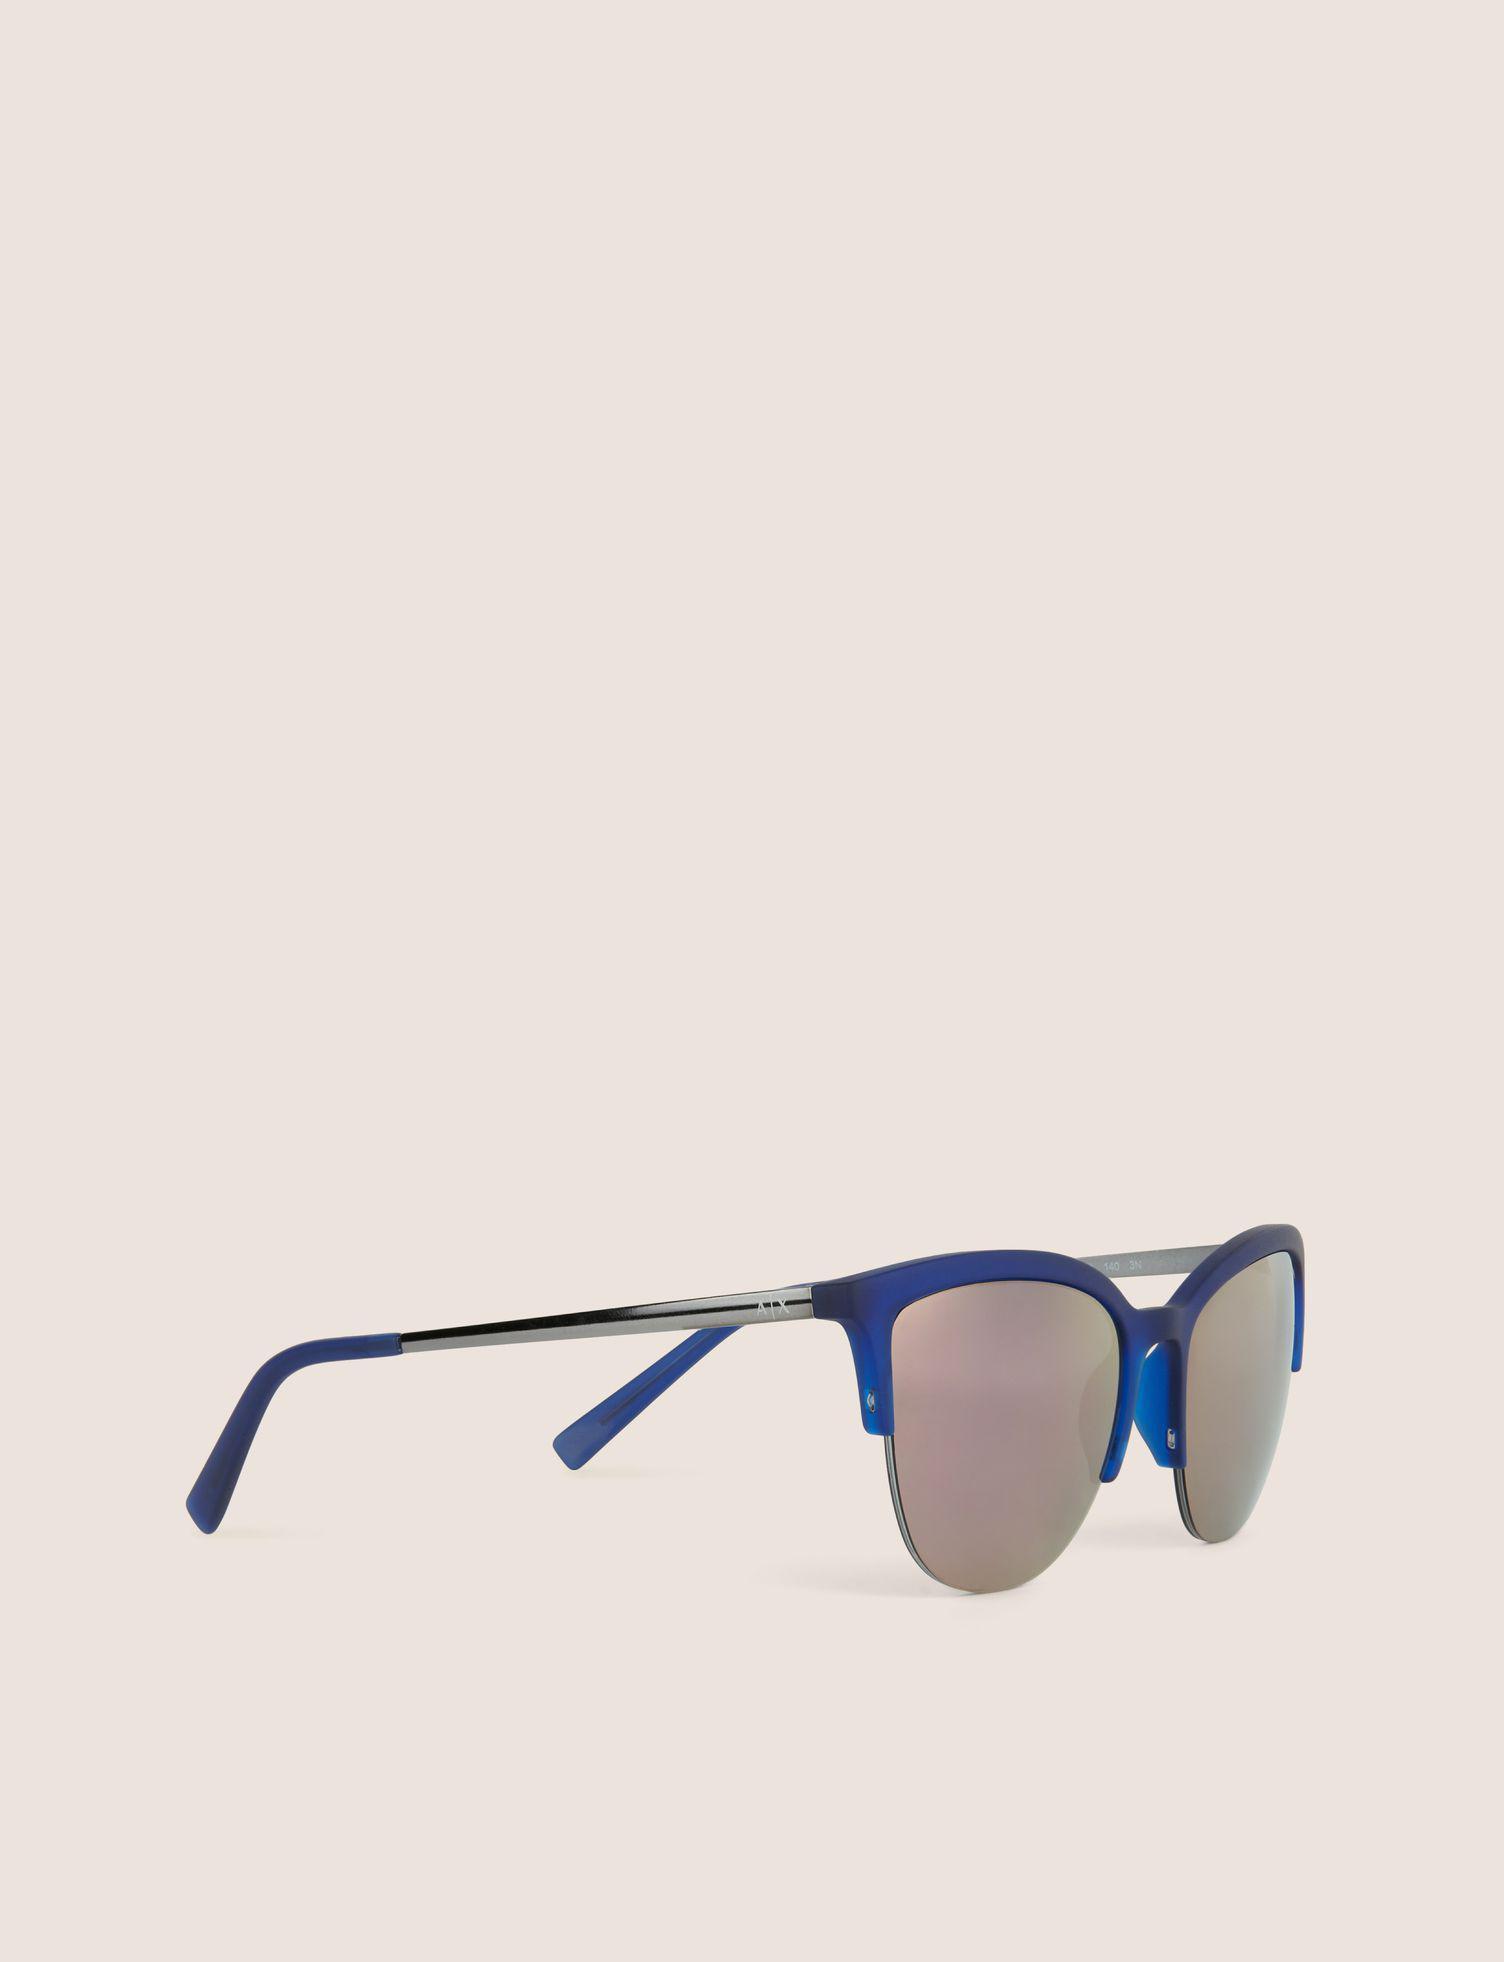 6f7638819d3 Lyst - Armani Exchange Sunglass in Blue